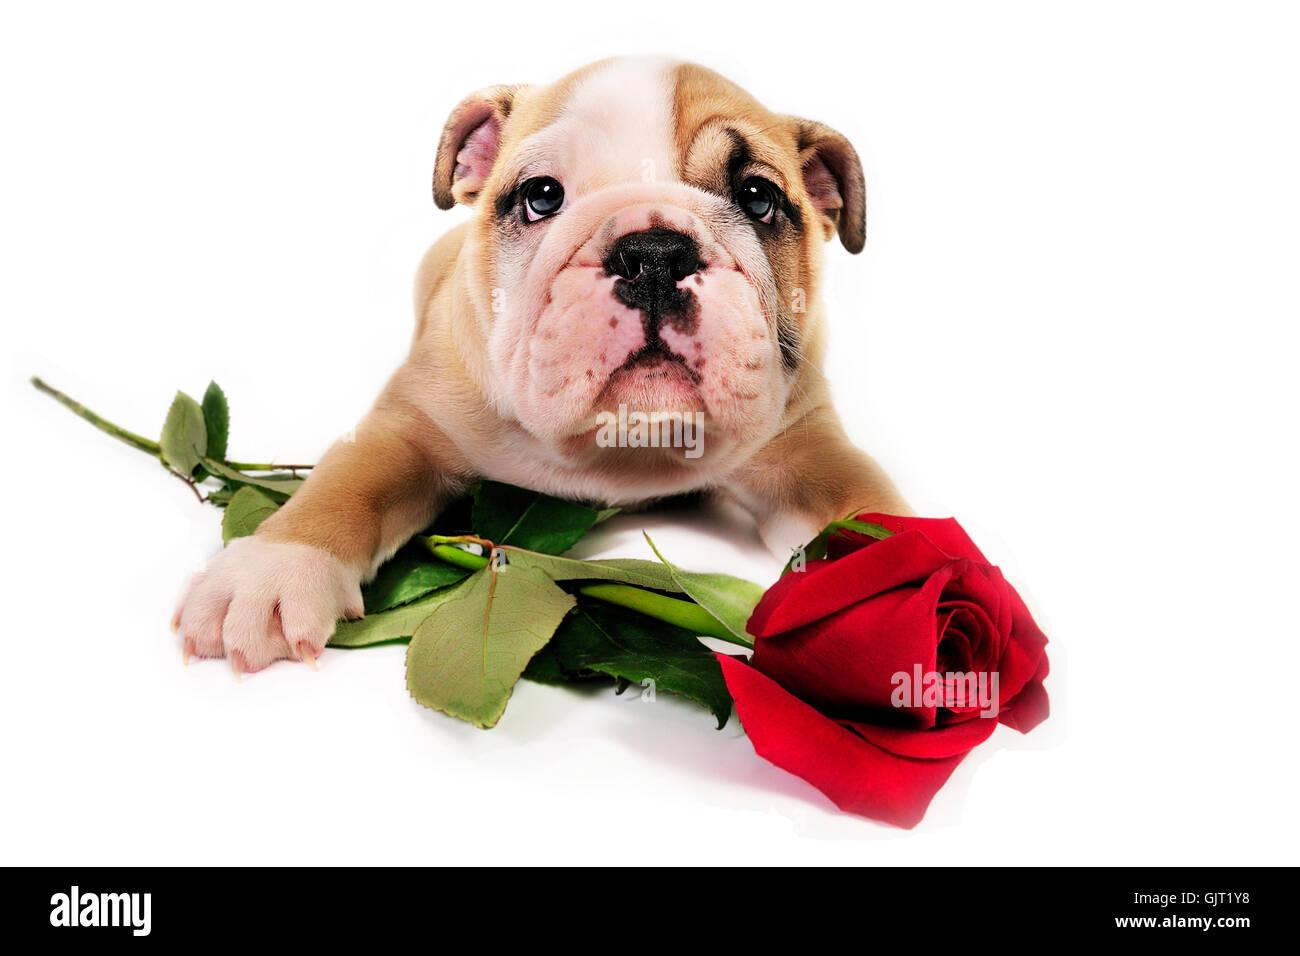 dogpuppy rose valentine animal canines companion cute dog domestic faithful flower house-pet love loving mammal - Stock Image